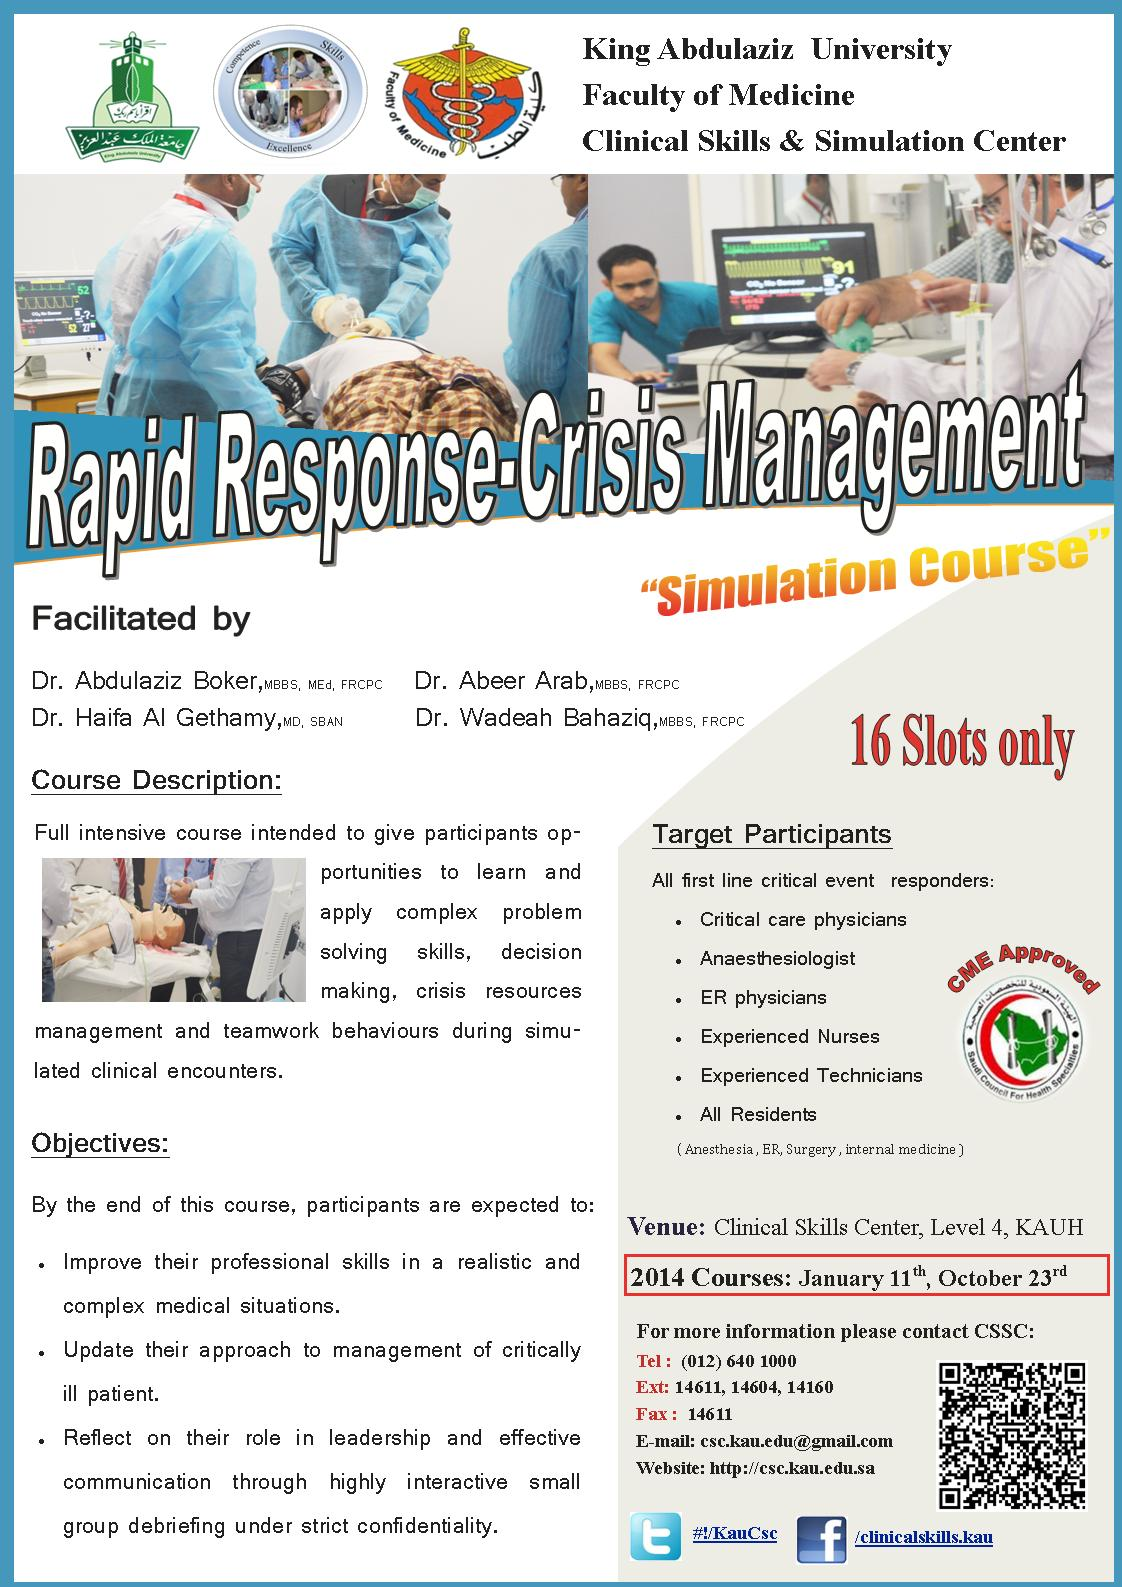 RR-CRM flyer